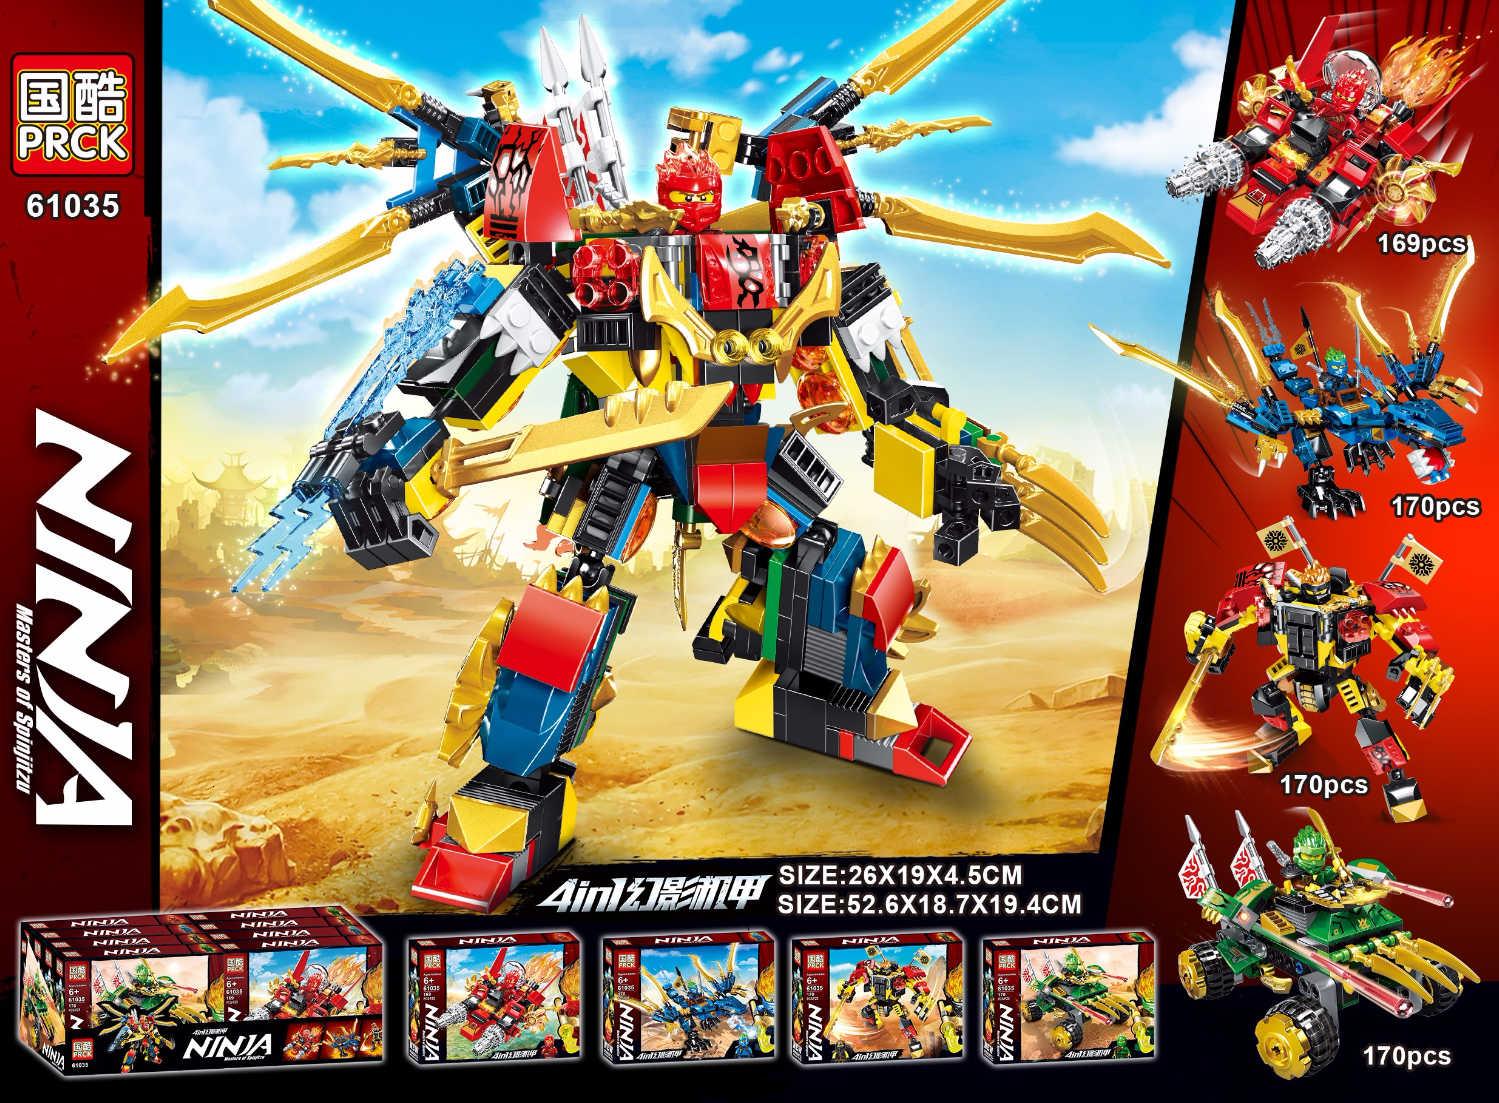 Bloques de construcción New 679 Uds Ninja 4in1 Big Mech modelo Kai Jay Cole, Zane Lloyd Mech Ninjagoes, bloques de juguete para niños